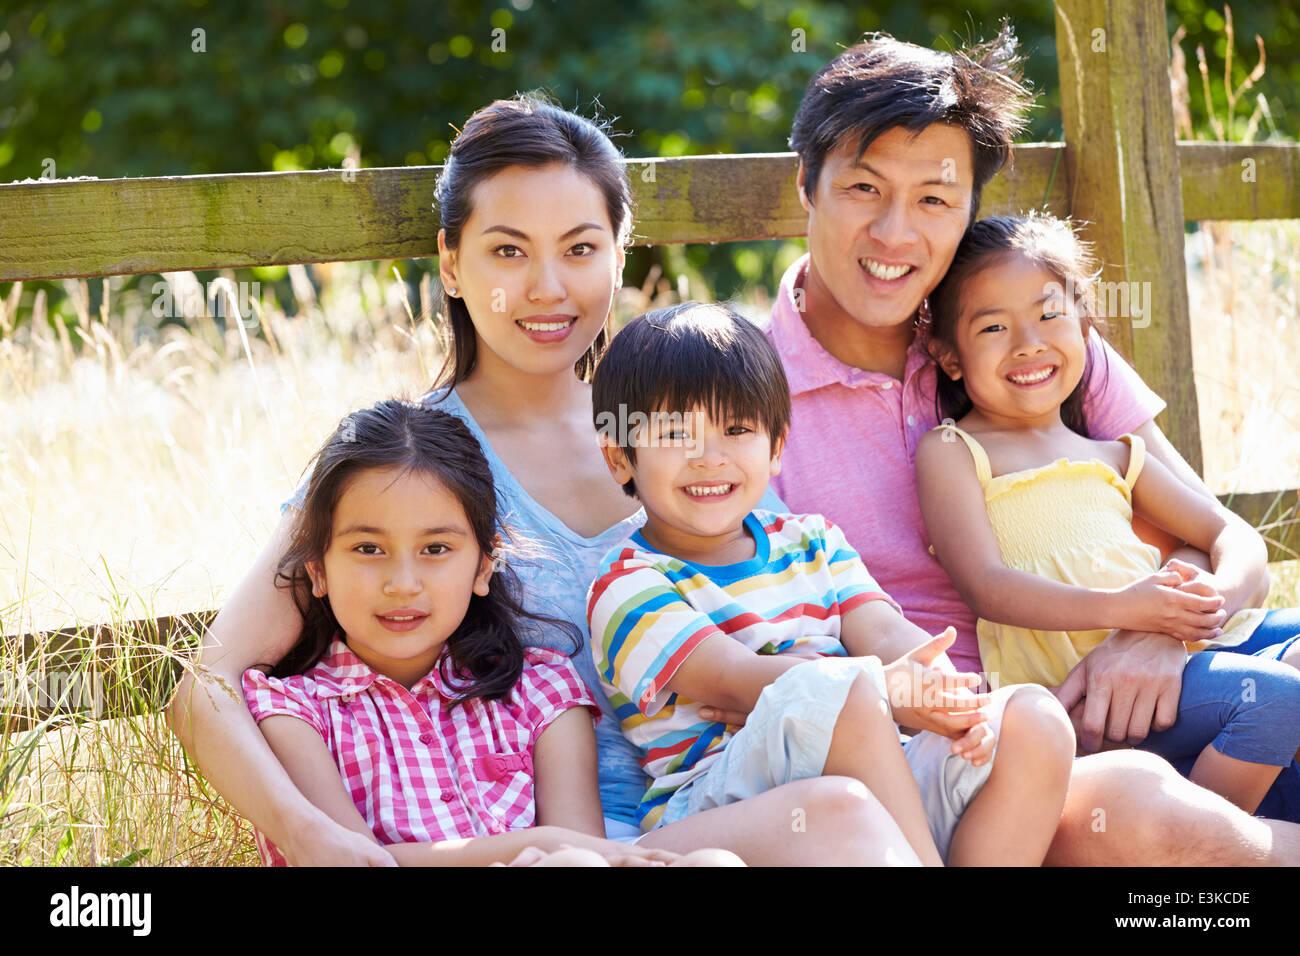 Familia de Asia relajante por puerta a pie de campo Imagen De Stock